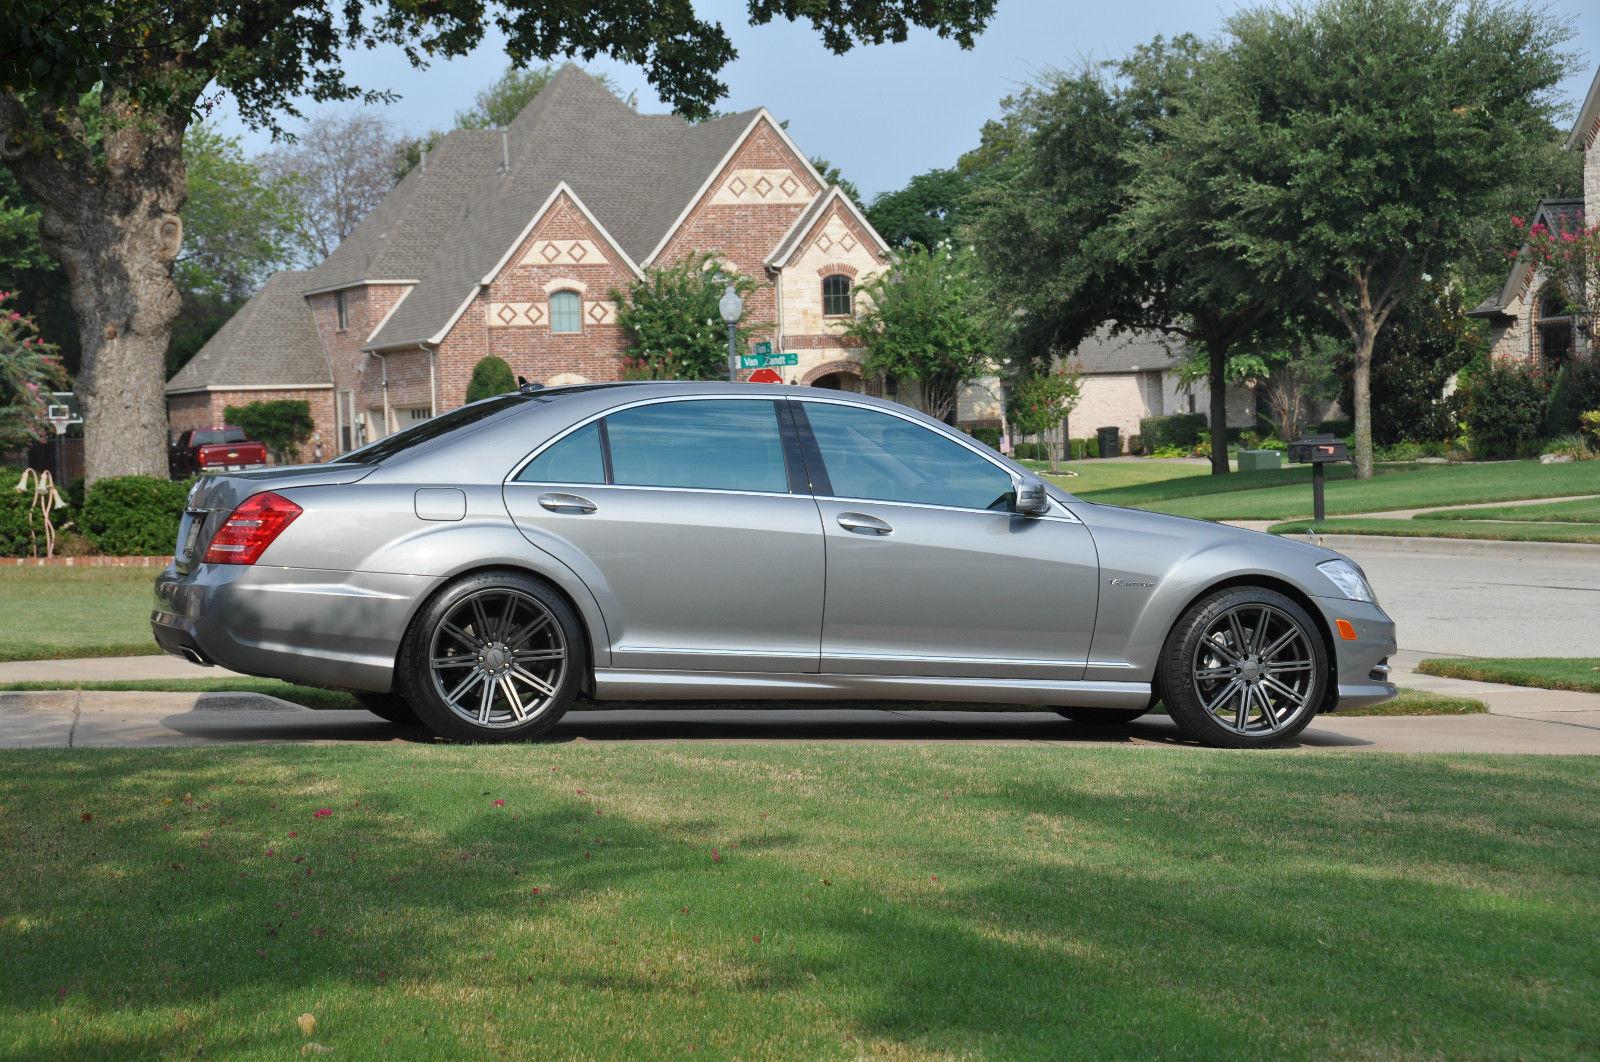 Mercedes benz w221 s550 on 20 vossen wheels benztuning for Mercedes benz custom rims